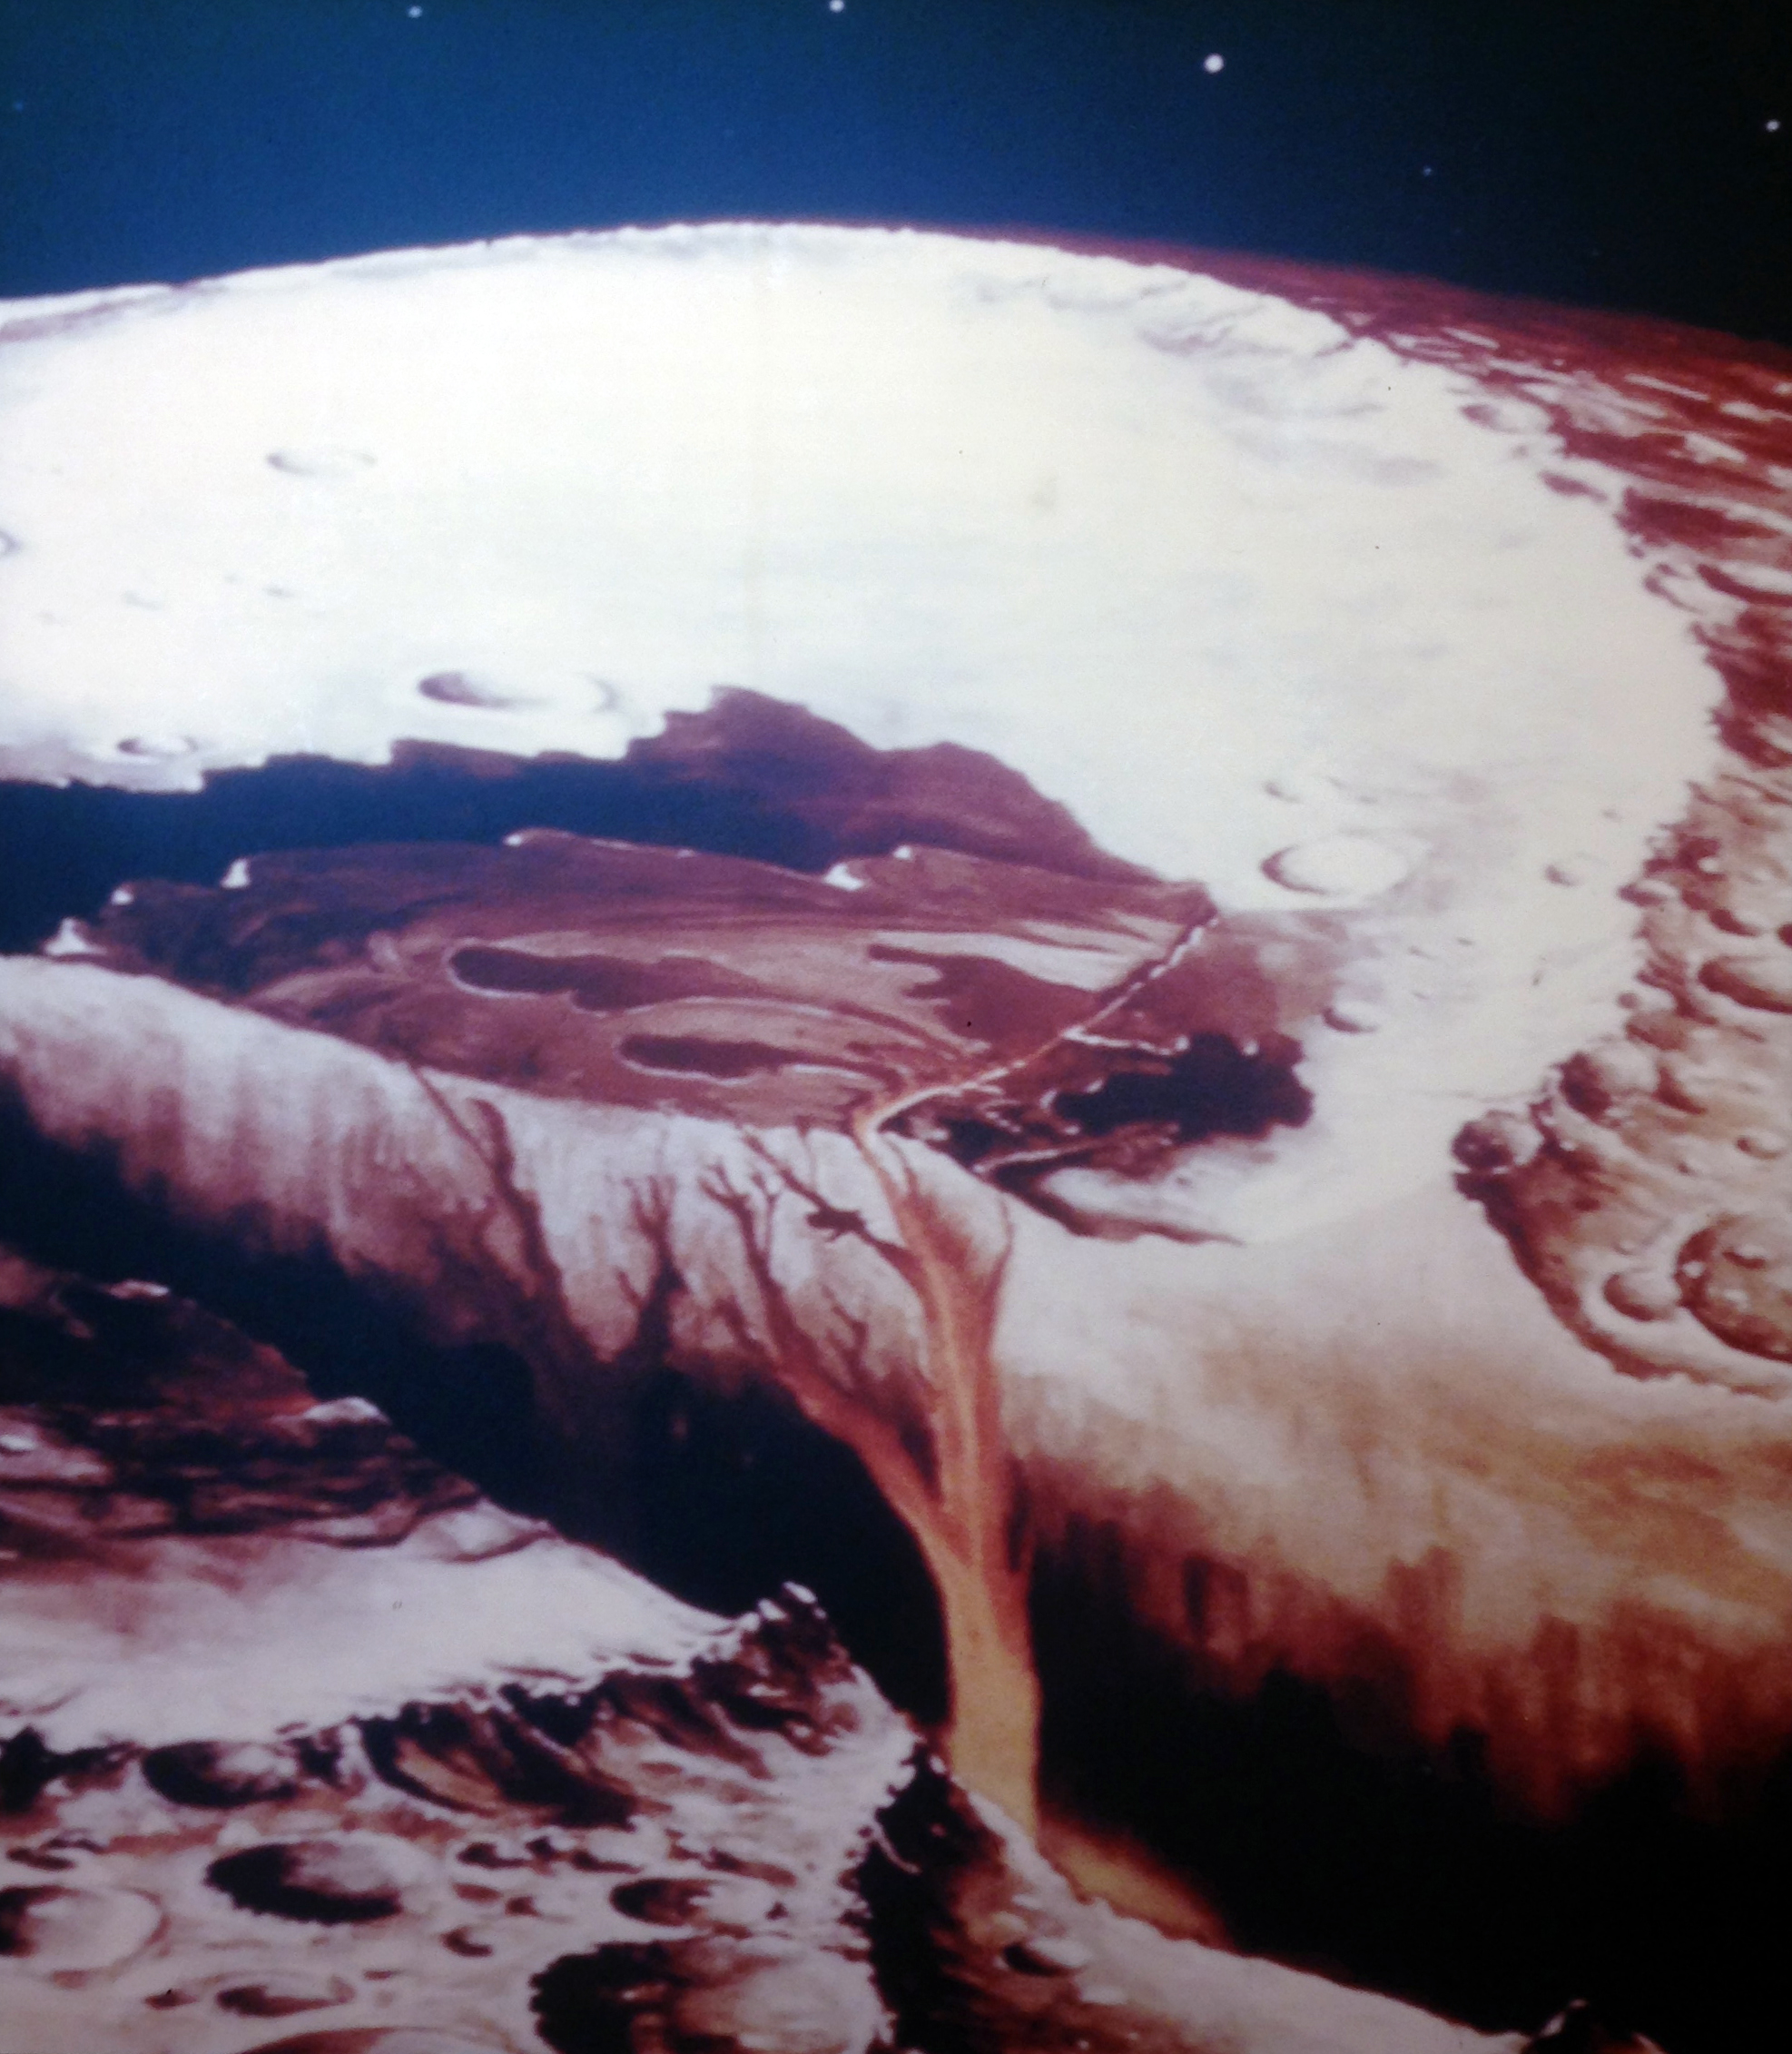 Source of Lunar Basalt